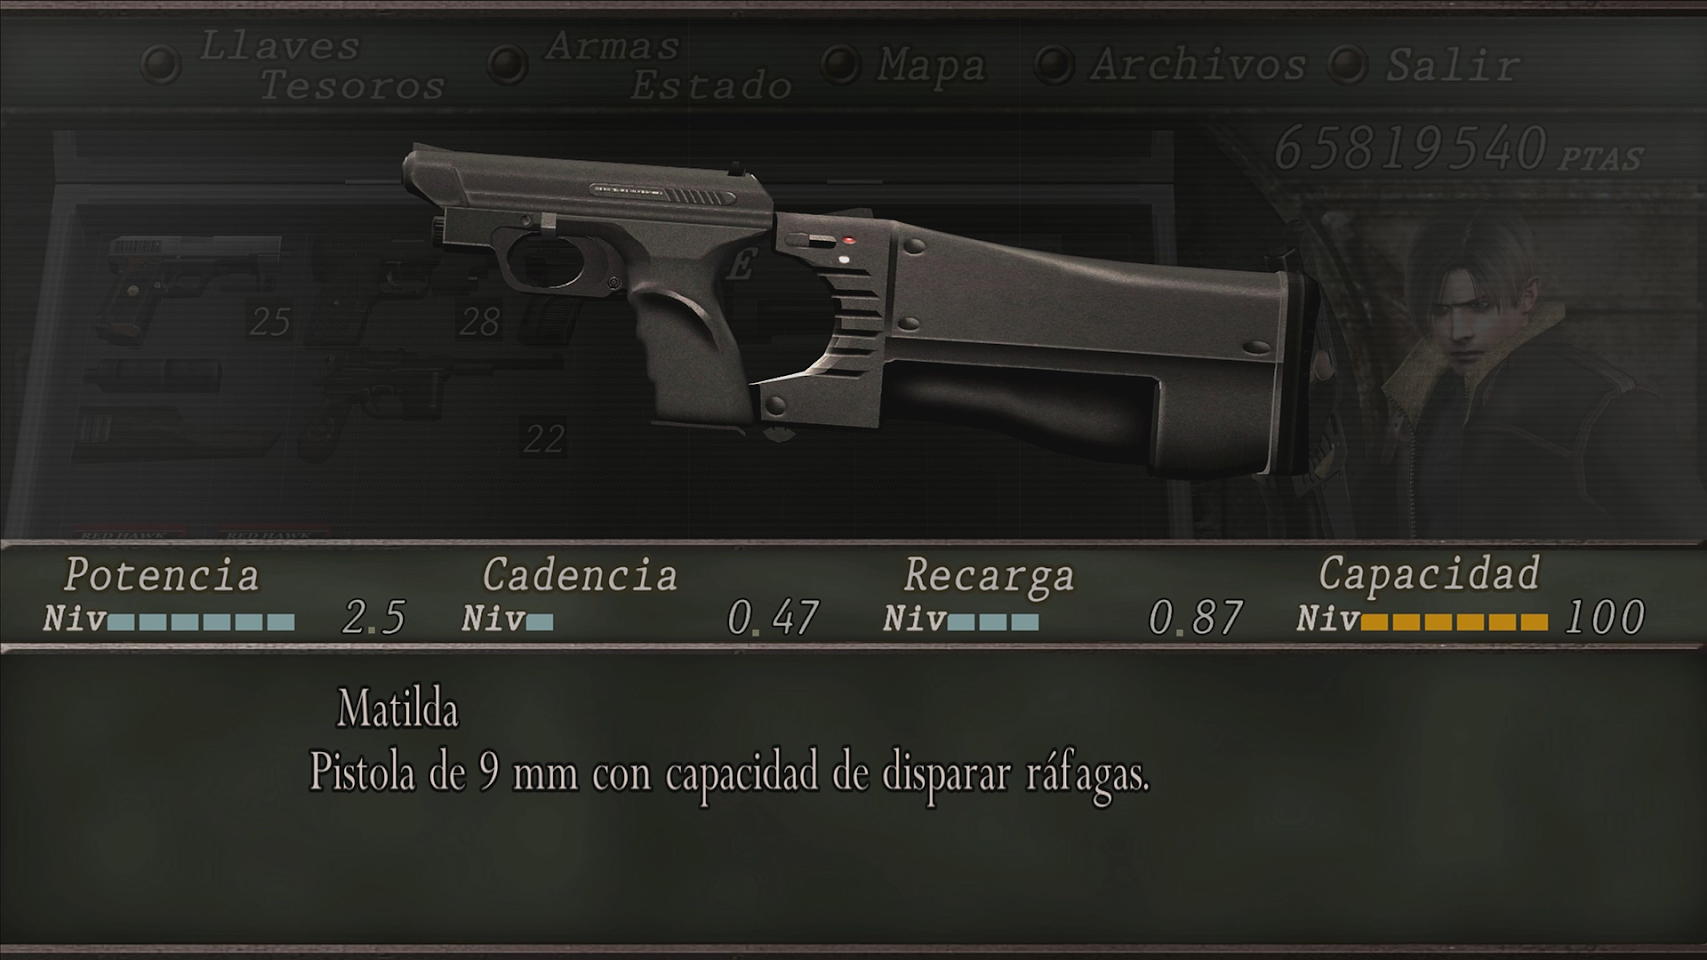 Ultimate HD Weapon Pack 8fYwFFvH5E2wOyPiwayEWb-e3nLgC_Us-qV6NT6JSv6u1aVjSGpTQRDiFVPrZBY7kDv78qSNAe_s5kUwUiXx56uMYd7tZqIlWsppjQ85sm-7n6IMiWm039WdHoROAI1K2MM1GAKmcam8gzTVSD-Tai5QtaT53UbspOV19K-UeSMwX1EF7FJd99yDYDCE0vu26TDZ6_4Nmv51nzSclr__bqvXRDDTZR9KGq6ovV2kmtw3emtBIUZCpx3Xi5M52F0jd387gZgNxNhbc_JYji1Wl6HAdEnIiKf2kgD8qKXrtQVjjuYPxtXA6UpwbHMZSZh8vpP29Tx-R9eKddWgodlFkU3vXerfEVD6F29R1mw5XMig914p2nx7LCZaYJNpNh56Yih8NtU1lKF-82EMmqRn-4cut4E5imcK39m8WtCl97O2v2SVuJ8qTMM7LOen7gnHfL0Qf4WH_AjG8uOtYd9ktx8BdyccdEoUnycAwy6tgy4MUOethMGhQJK2GtWSjyfeXkYKC6ge1FQyBWtwvDj5JthCoNZw5Zw8A4DR69-AqQktI8QWfn6XSI2idXhLJ4FgjooanqPgiwZfWW5AnE6NUzdXqp3F-6gk5SWsNZhO_eMo0HUi=w1707-h960-no